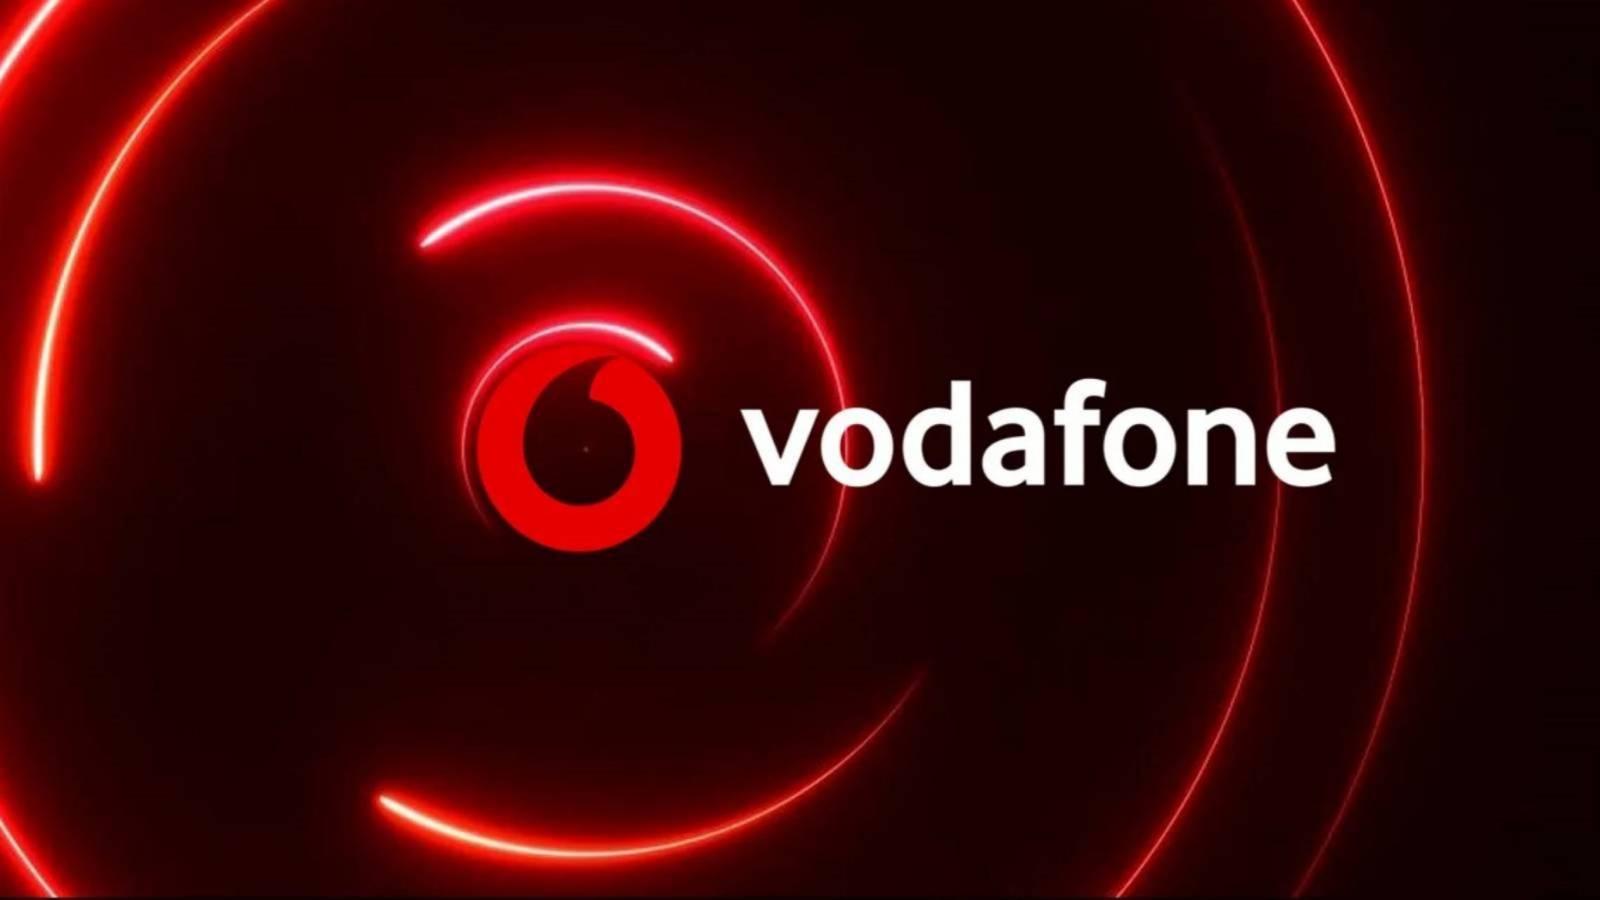 Vodafone parole